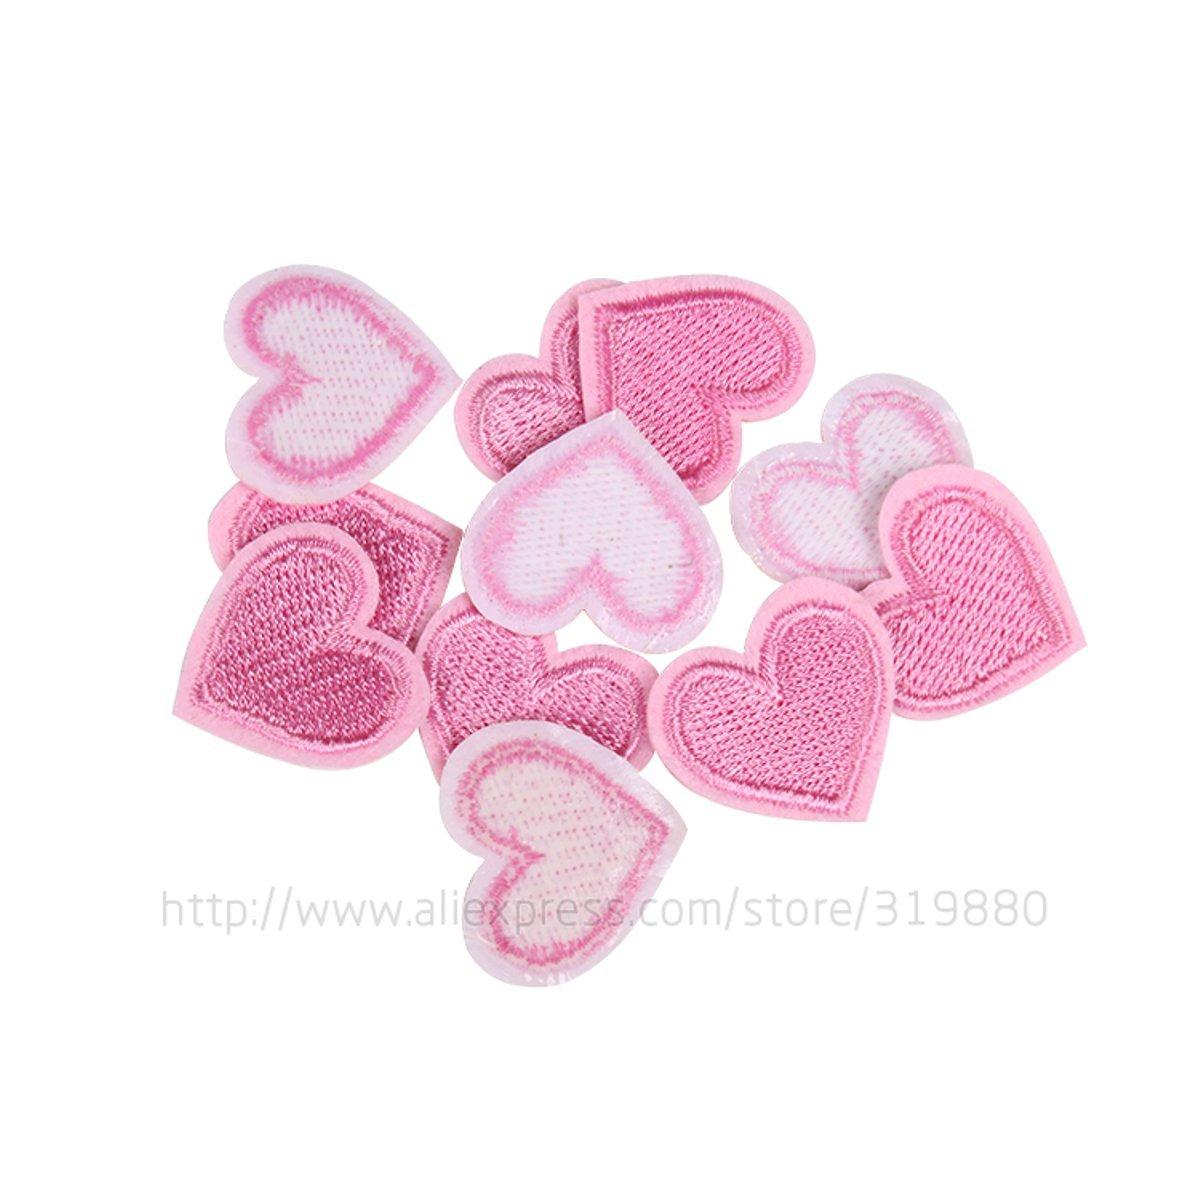 HDTTCX - Parche para planchar - parche para transferencia de ropa - 2,72,5 cm, parches de amor rosa, parches para bricolaje, ropa, bordado, capítulo, goma, ...